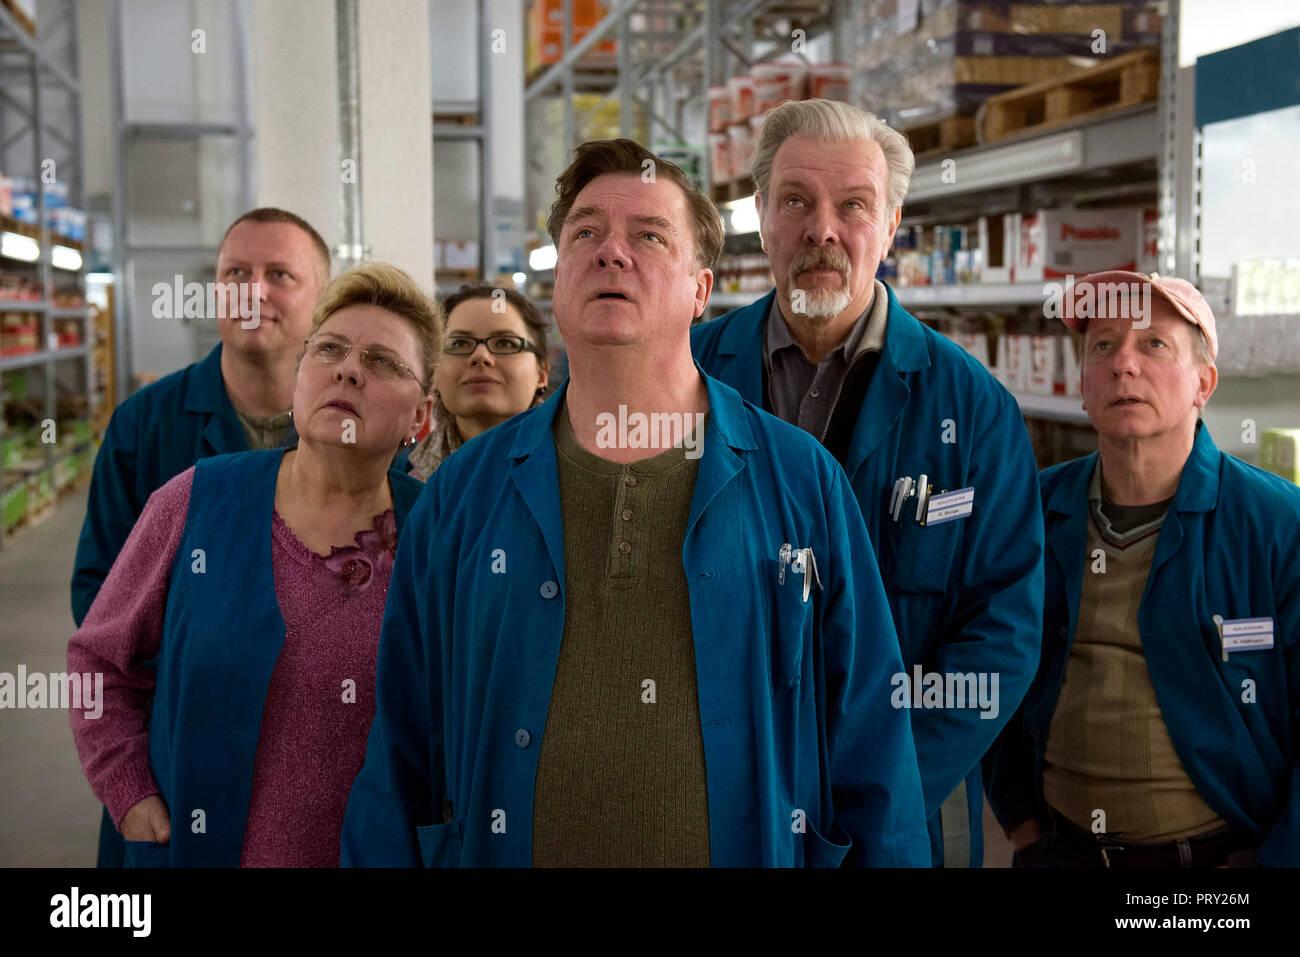 Prod DB © Sommerhaus Filmproduktionen / DR UNE VALSE DANS LES ALLEES IN DEN GANGEN de Thomas Stuber 2018 ALL. Ramona Kunze-Libnow Peter Kurth Andreas - Stock Image